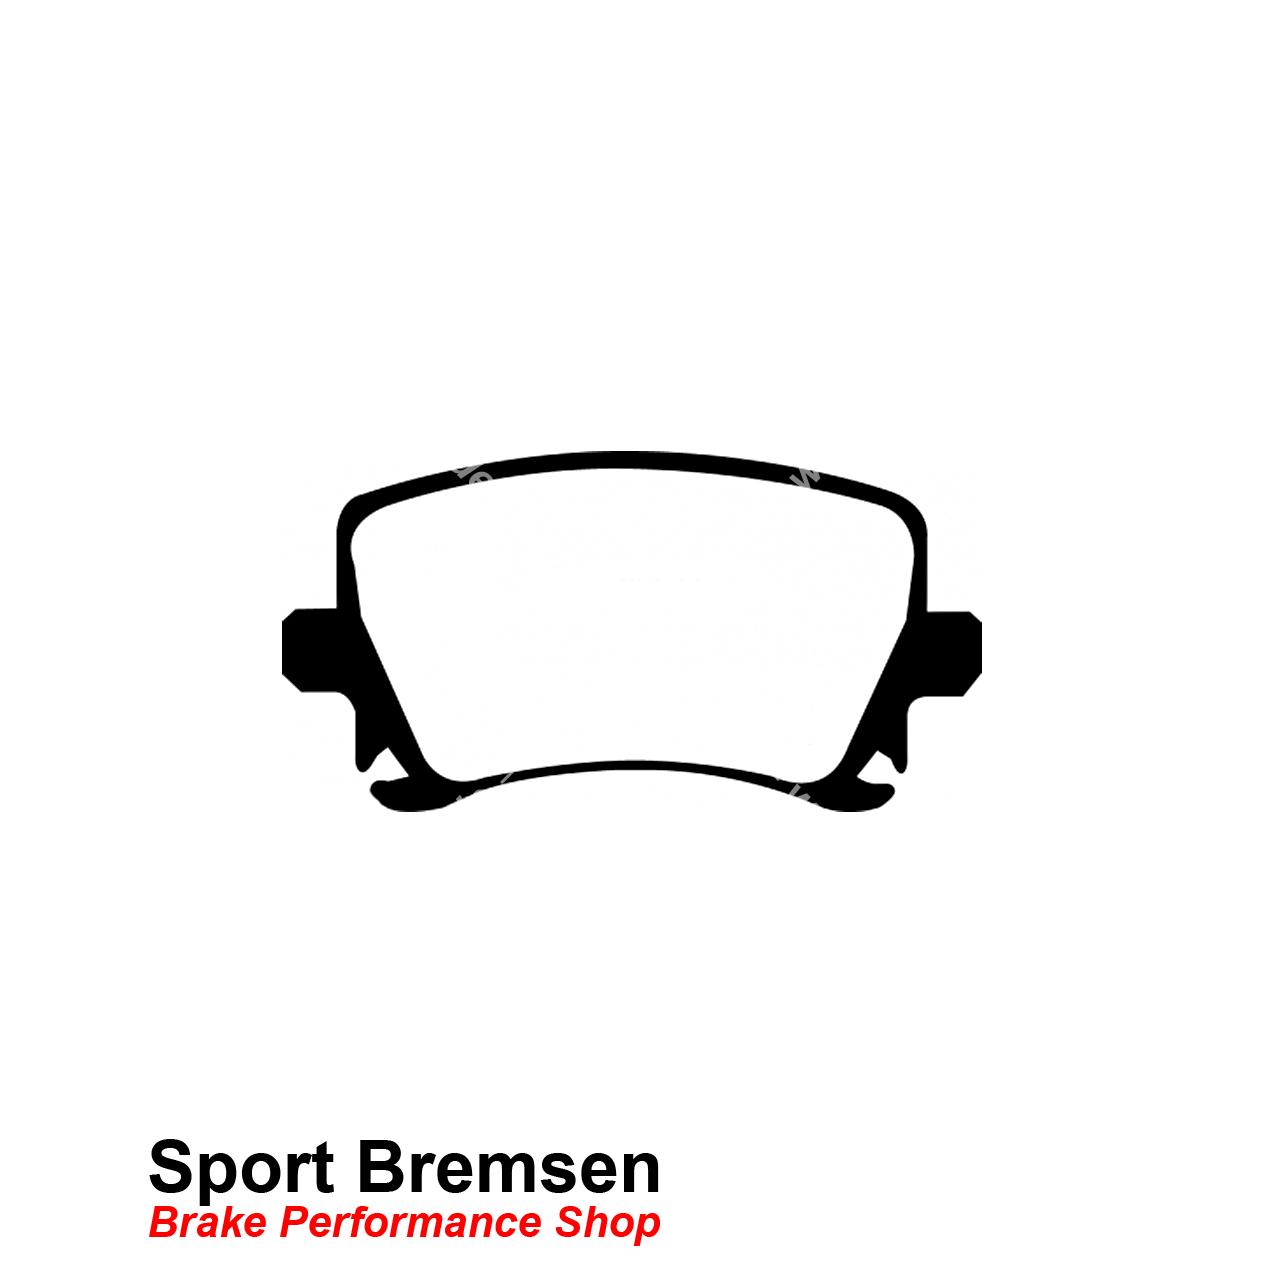 Ebc Redstuff Keramik Bremsbelage Fur Vw Golf 5 R32